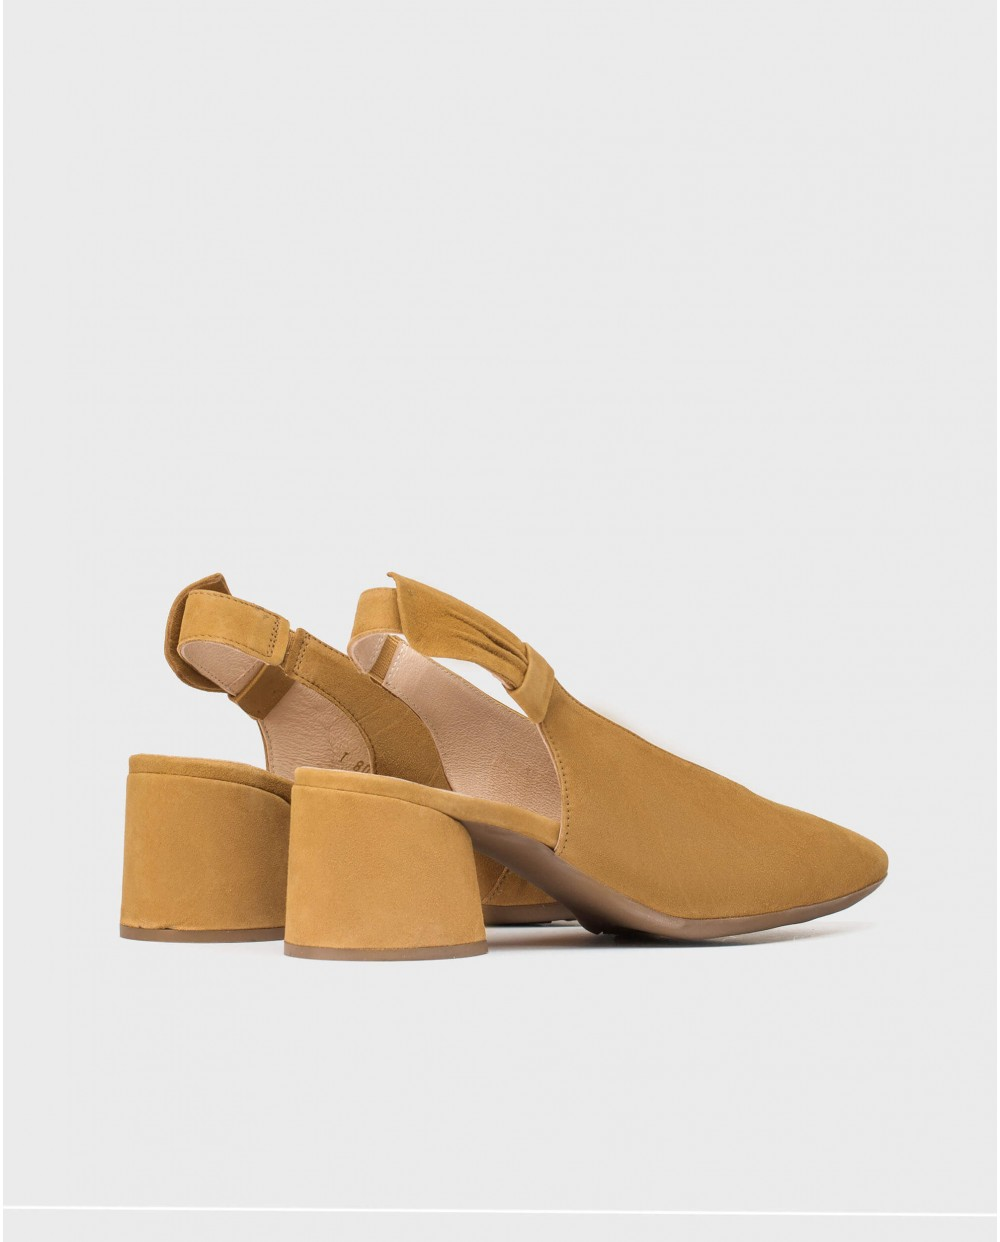 Wonders-Heels-Suede shoe with bow